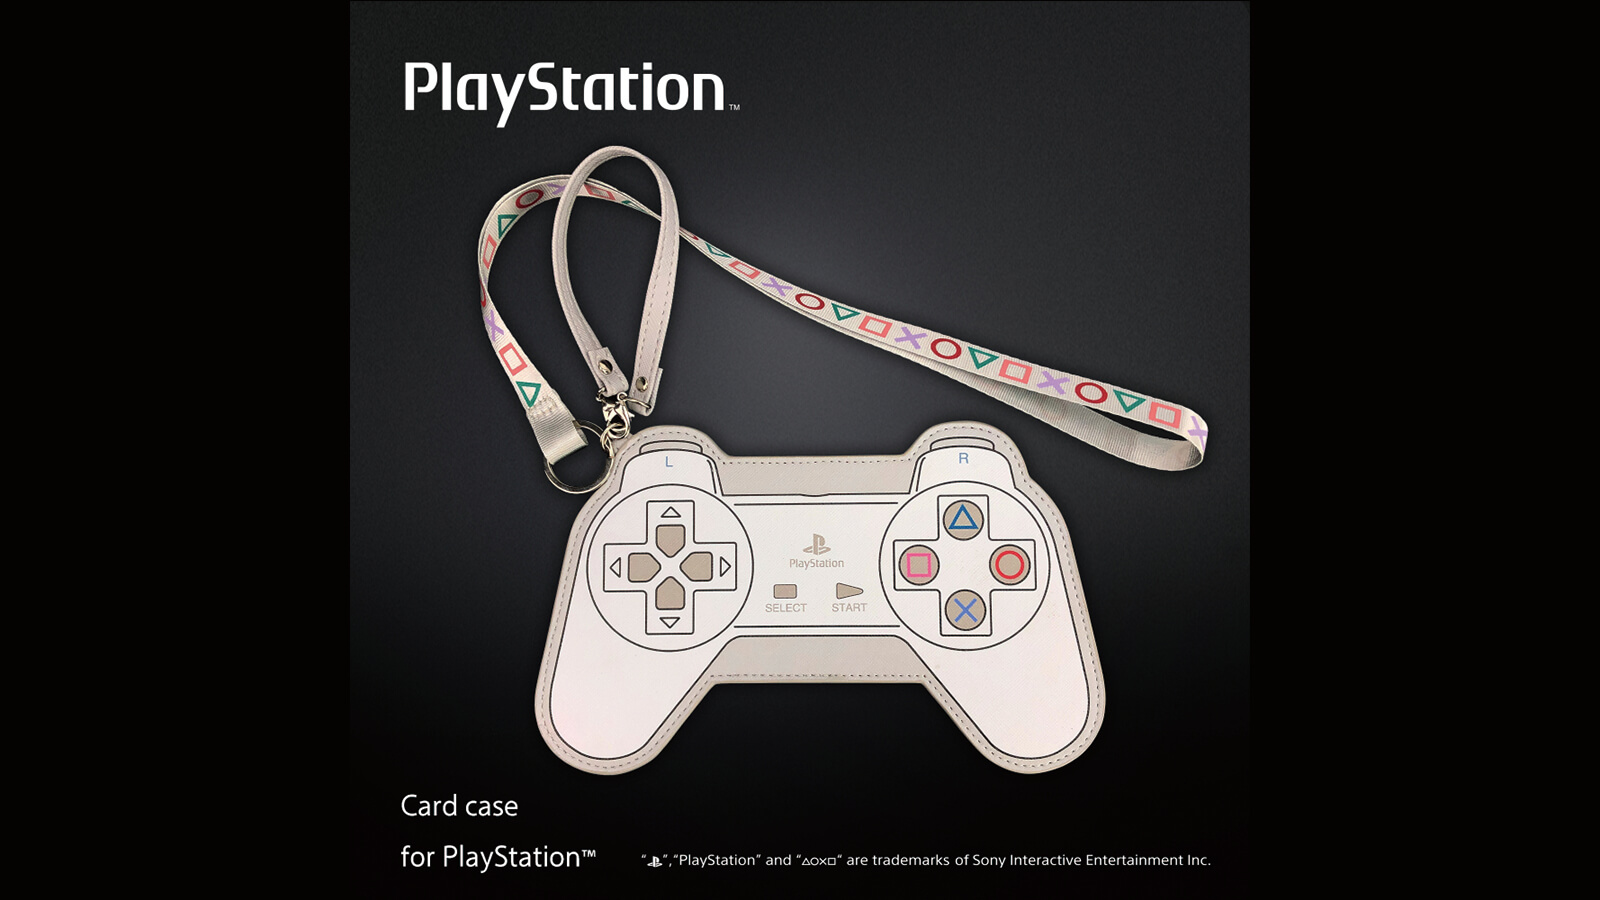 PlayStation主題紀念品, 官方授權周邊產品, Fanthful, GSE,